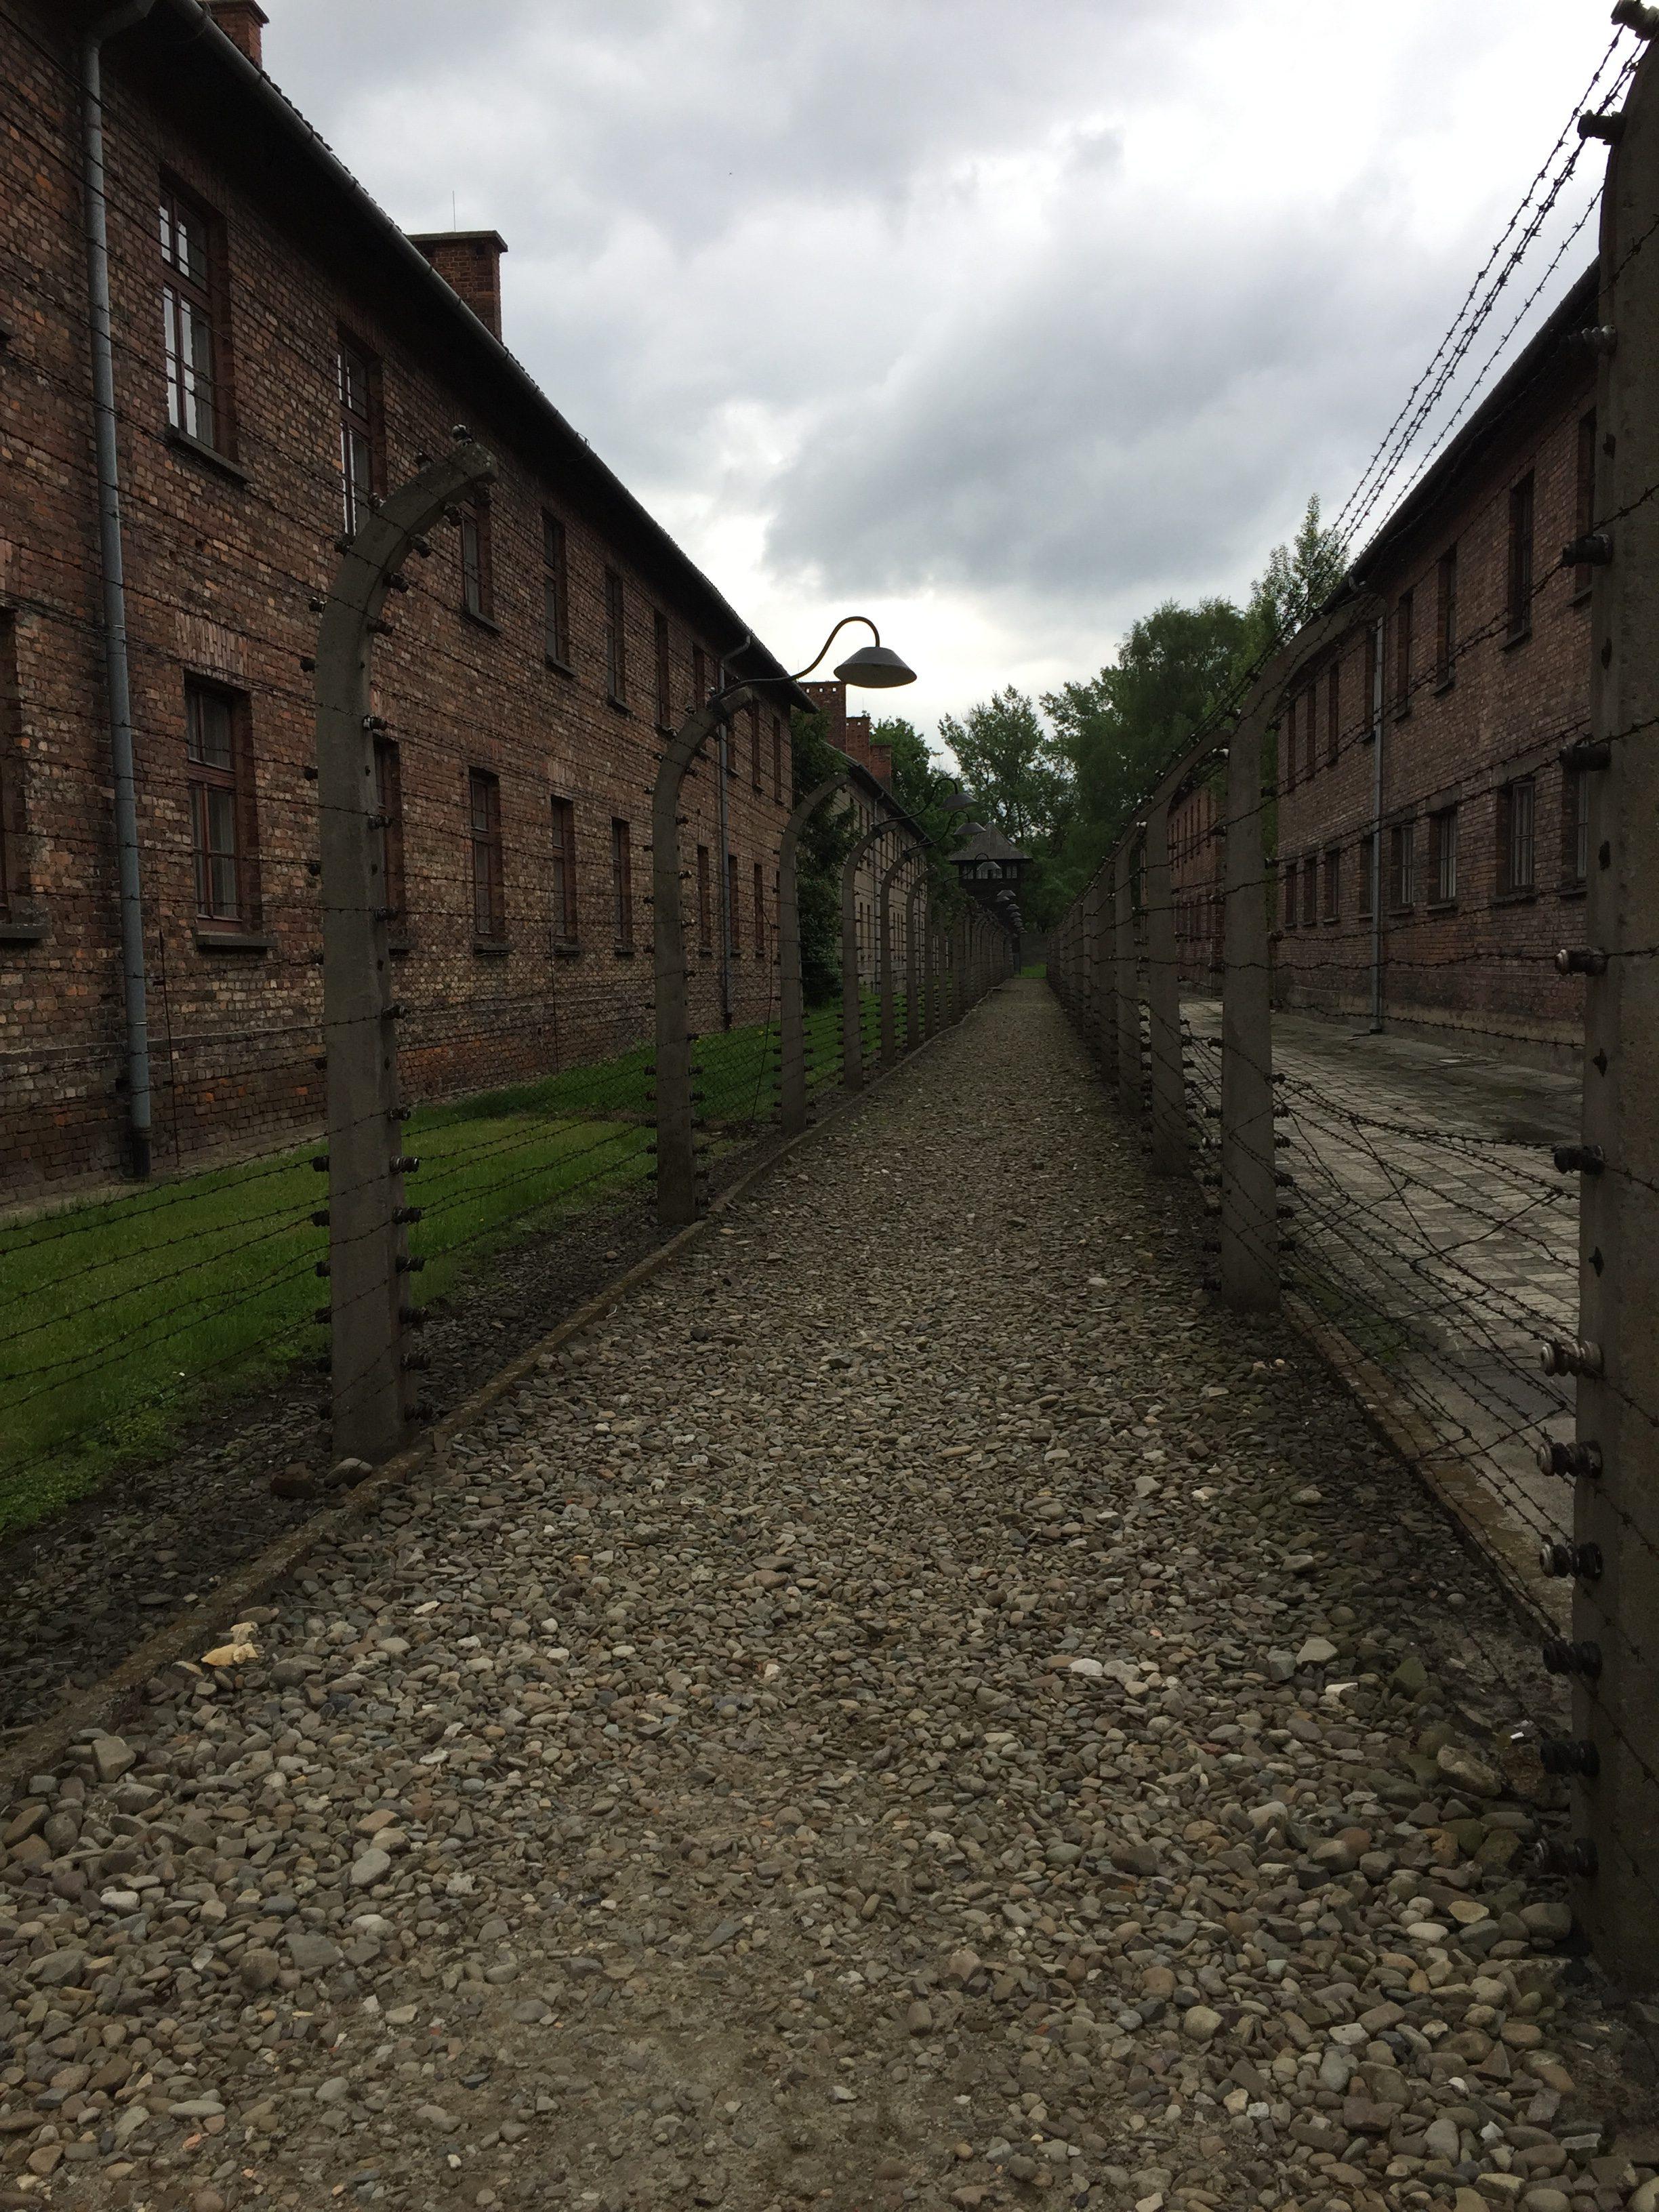 A Visit to Auschwitz - fences